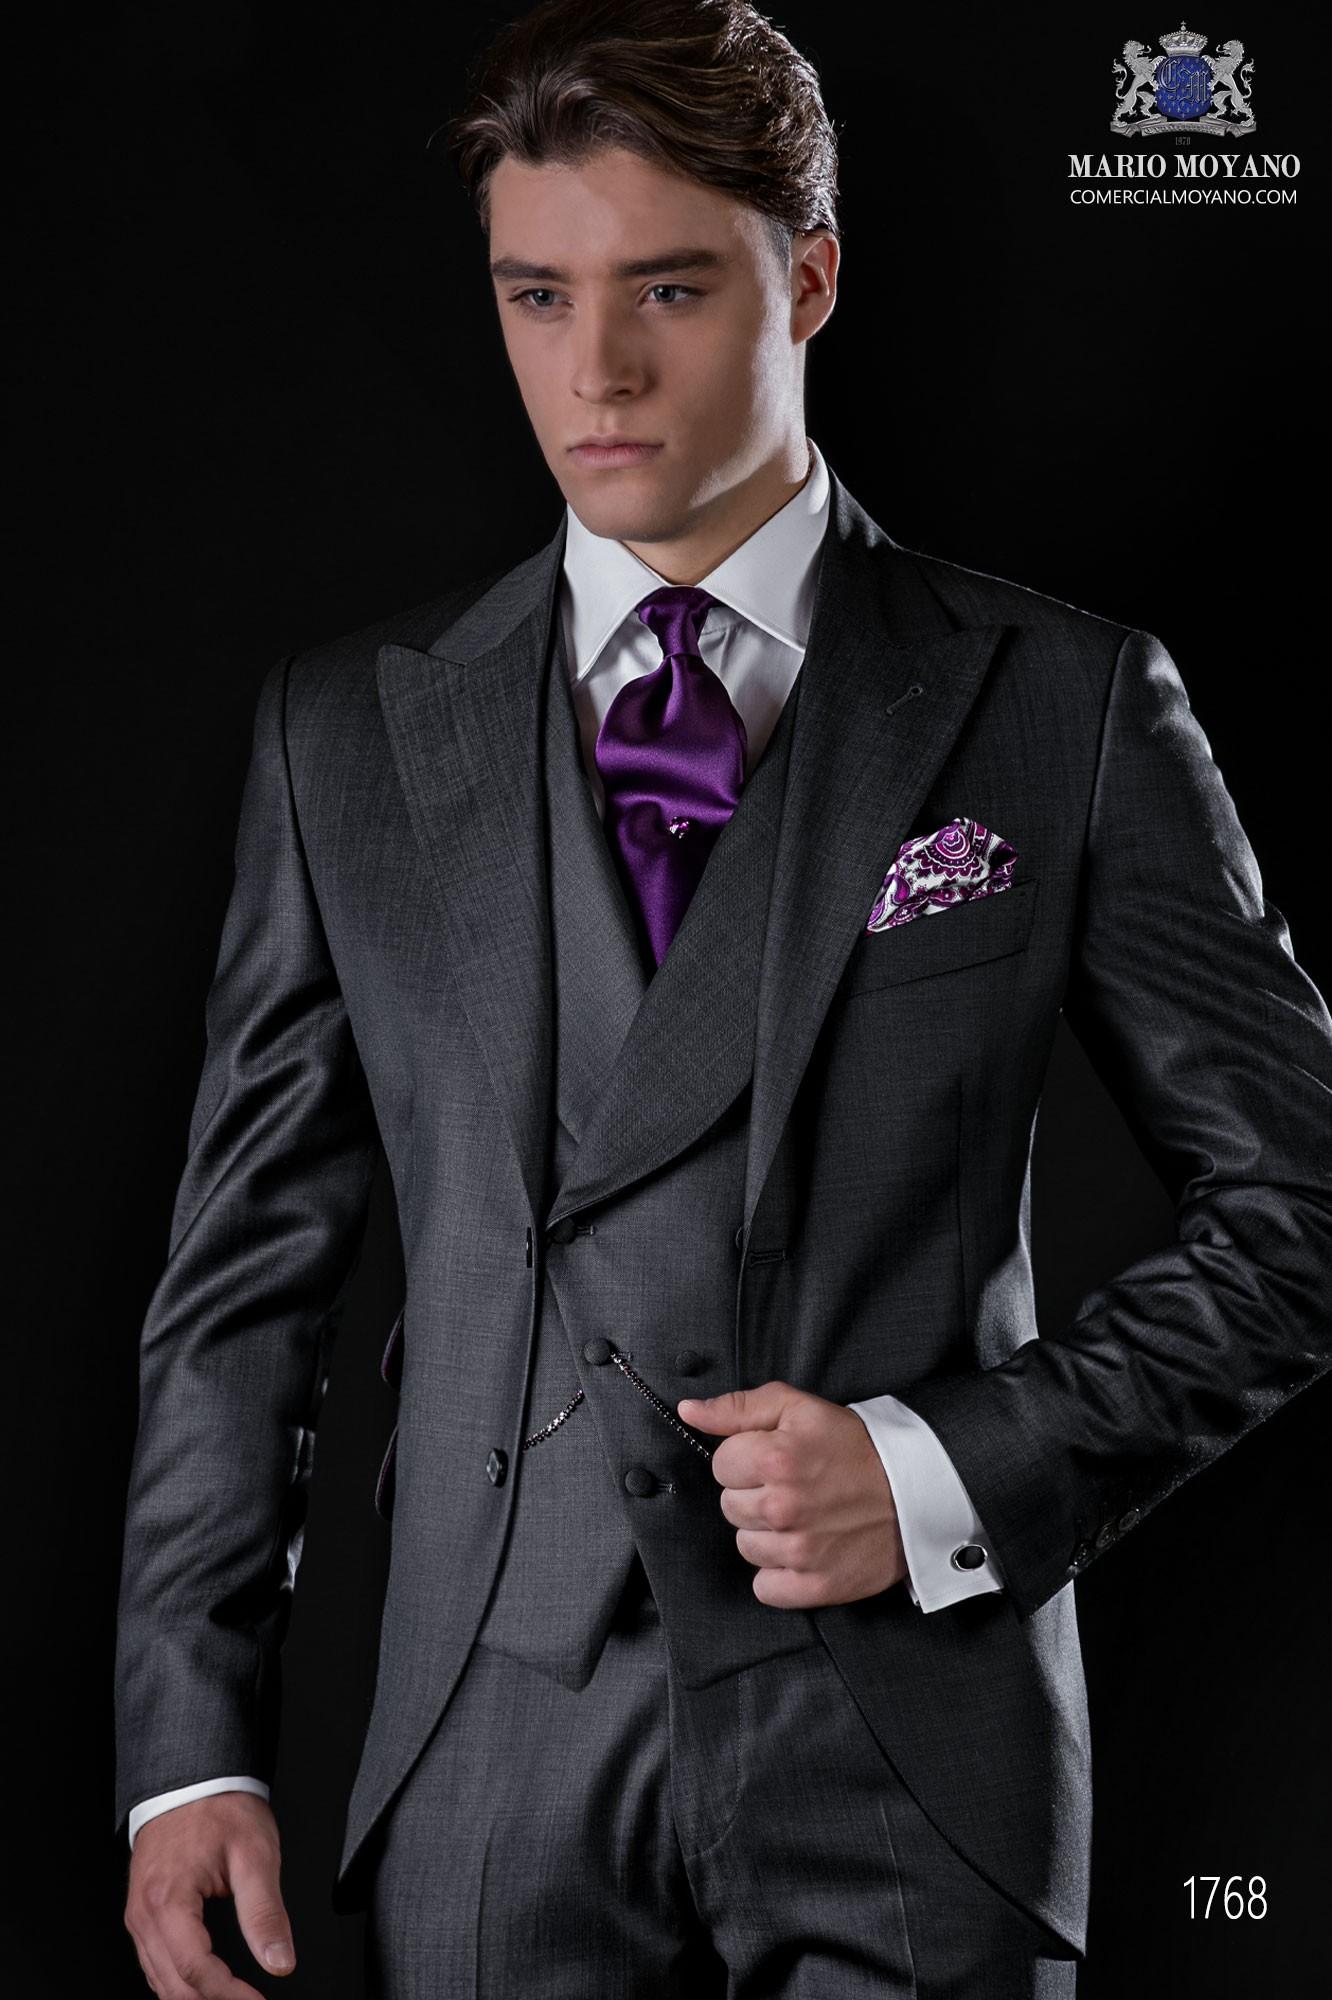 Italian bespoke suit anthracite grey fil a fil wool mix model 1768 Ottavio Nuccio Gala